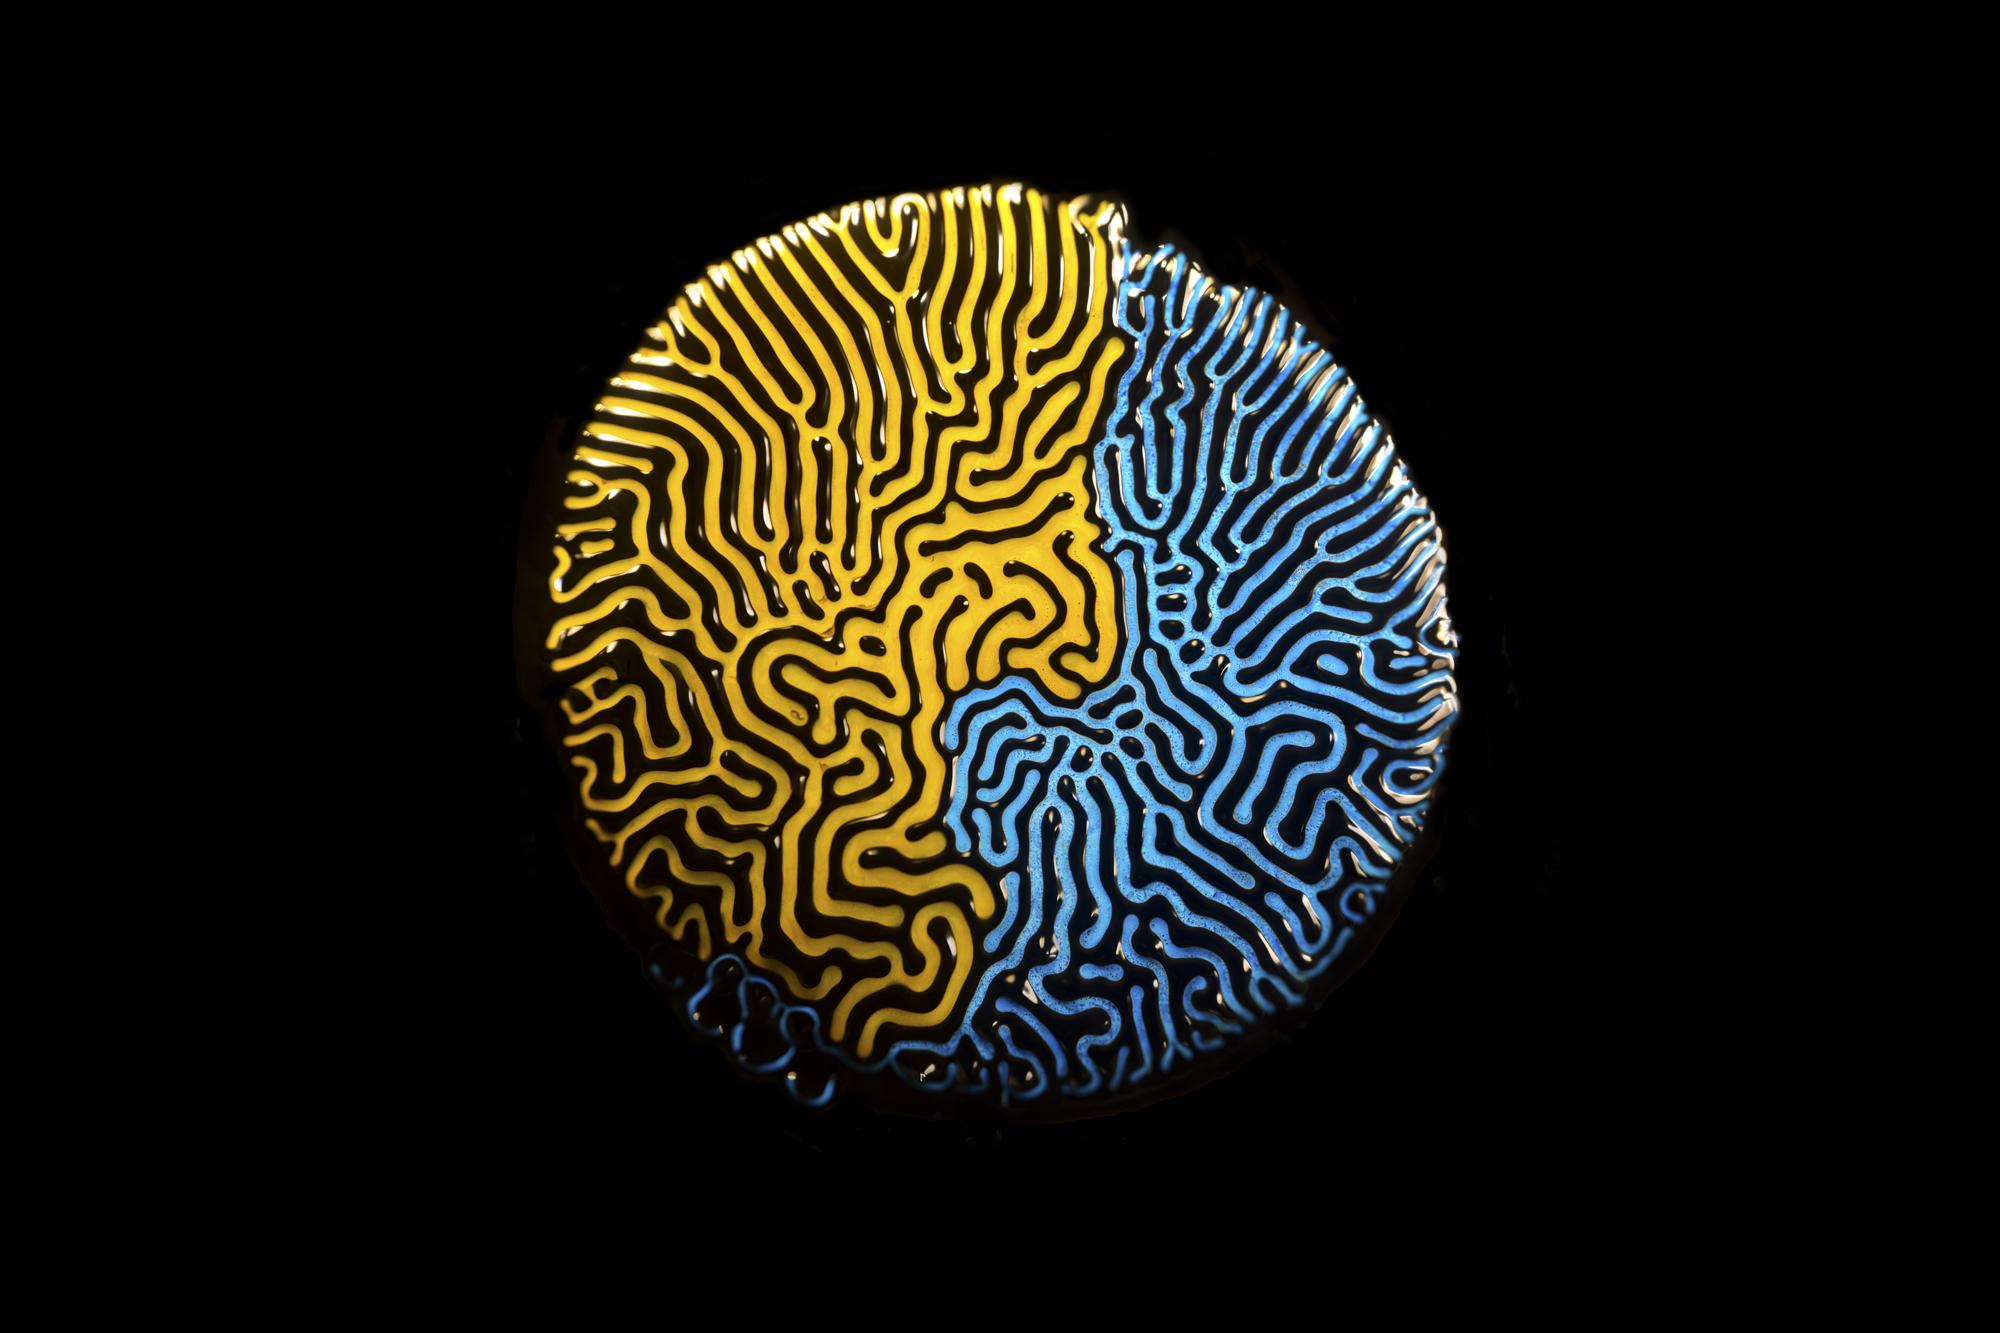 Ferrofluid 6